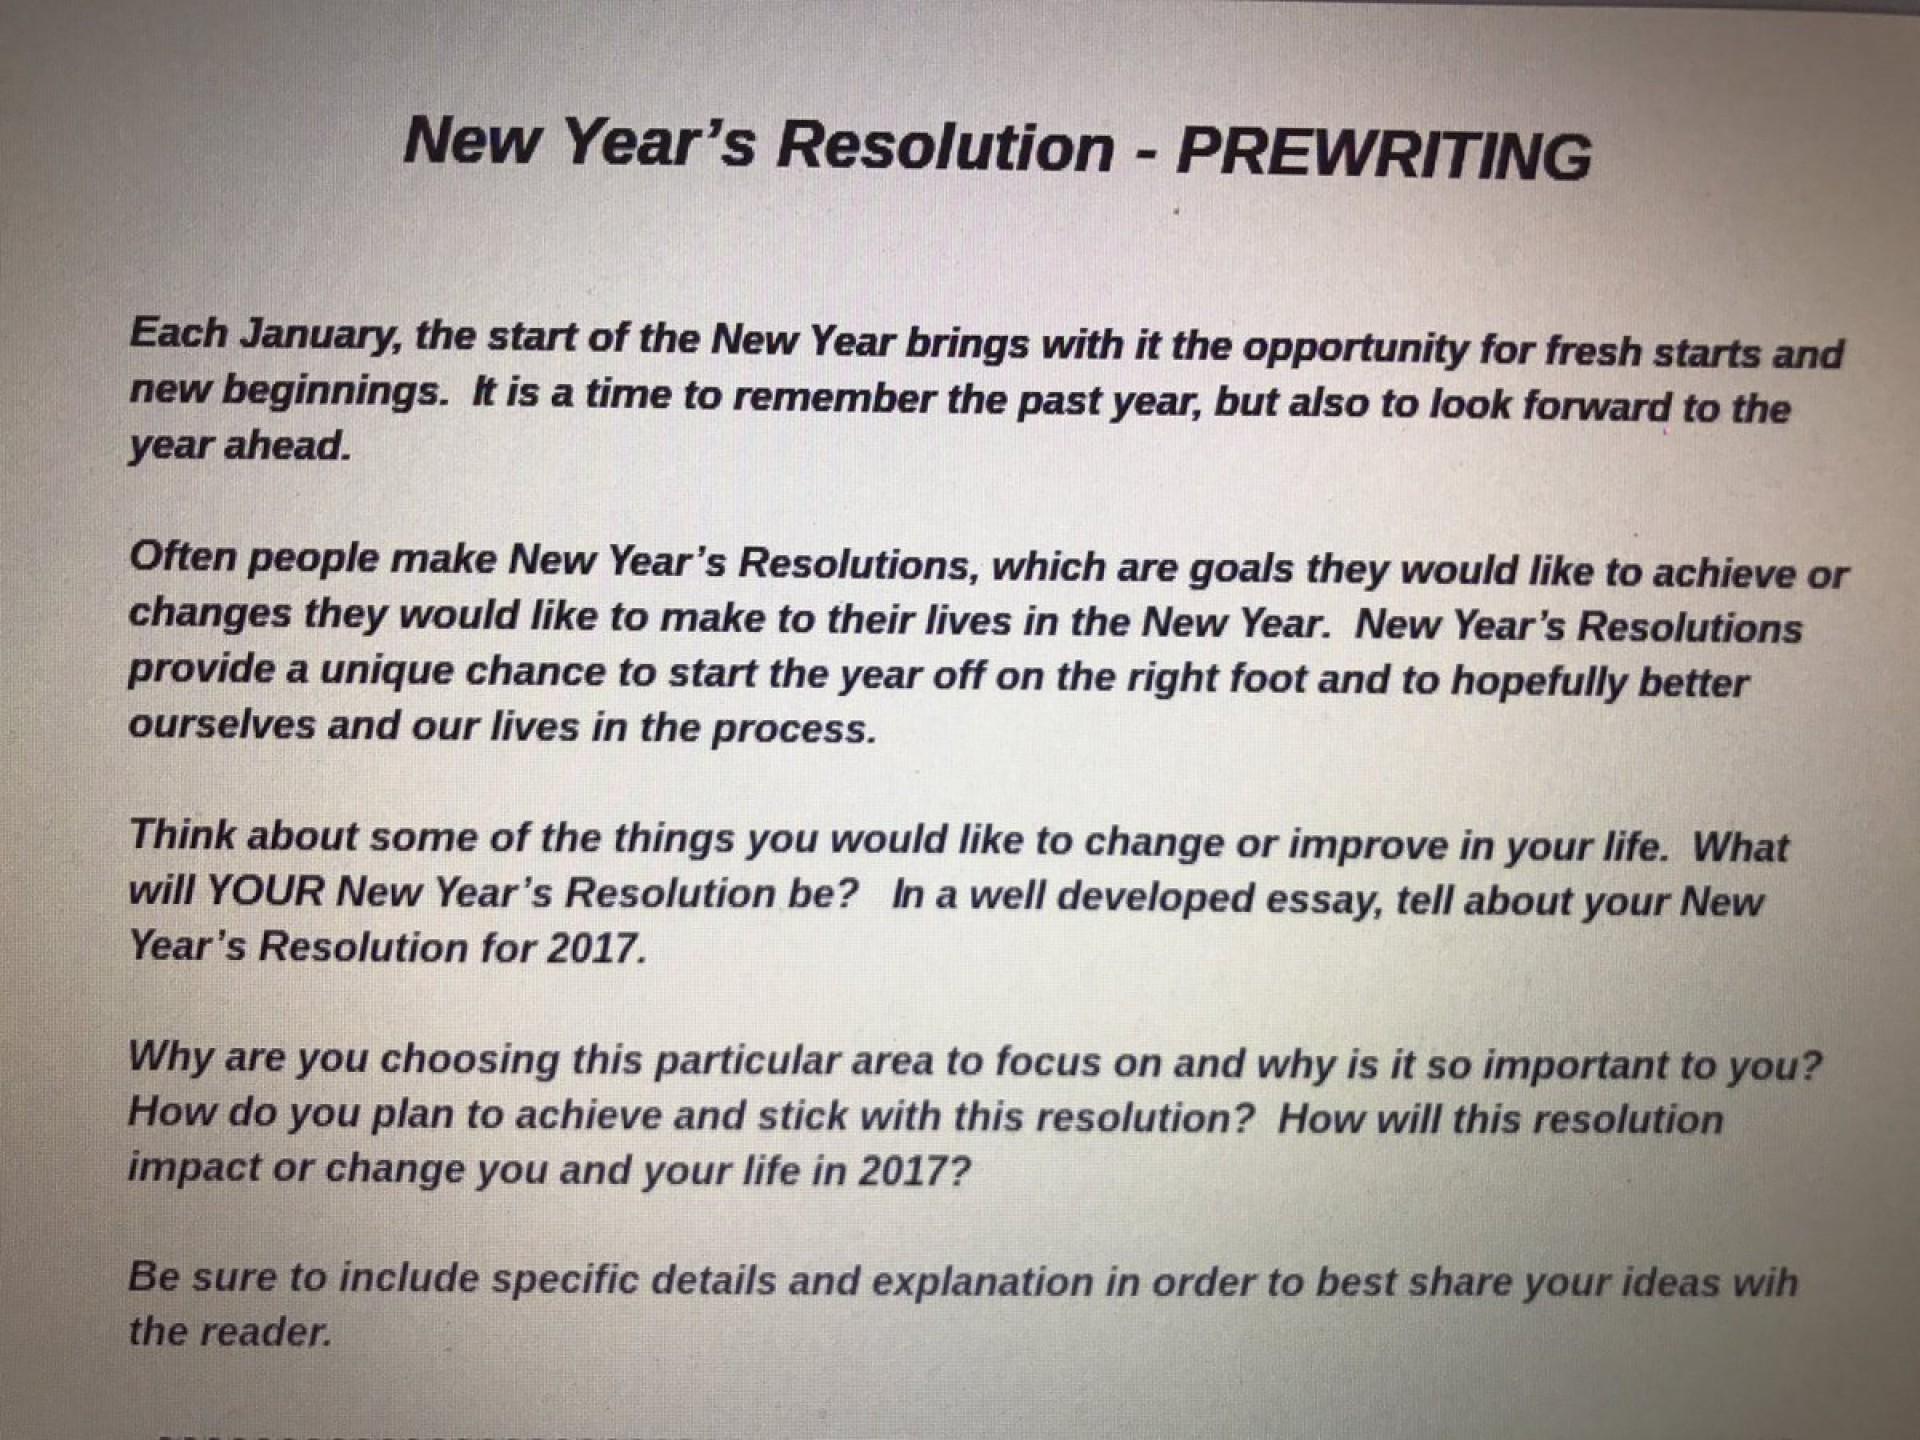 009 My New Year Resolution Essay C1qmqkevqaazf95 Singular High School Student 2019 For Class 5 1920